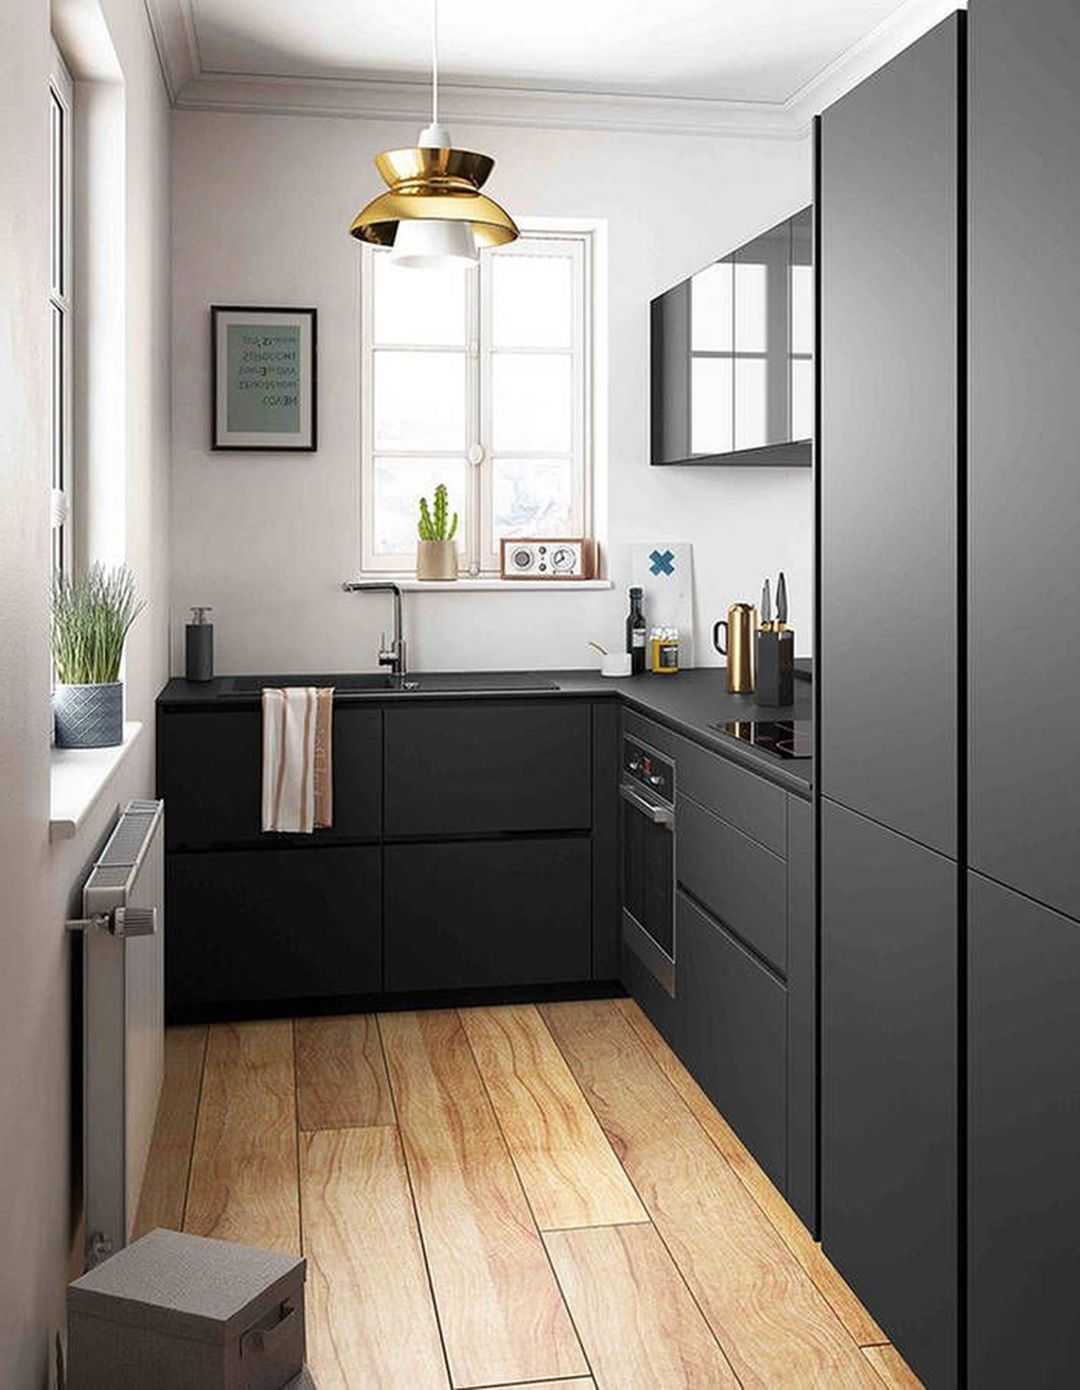 Small Kitchen Design Ideas 2020